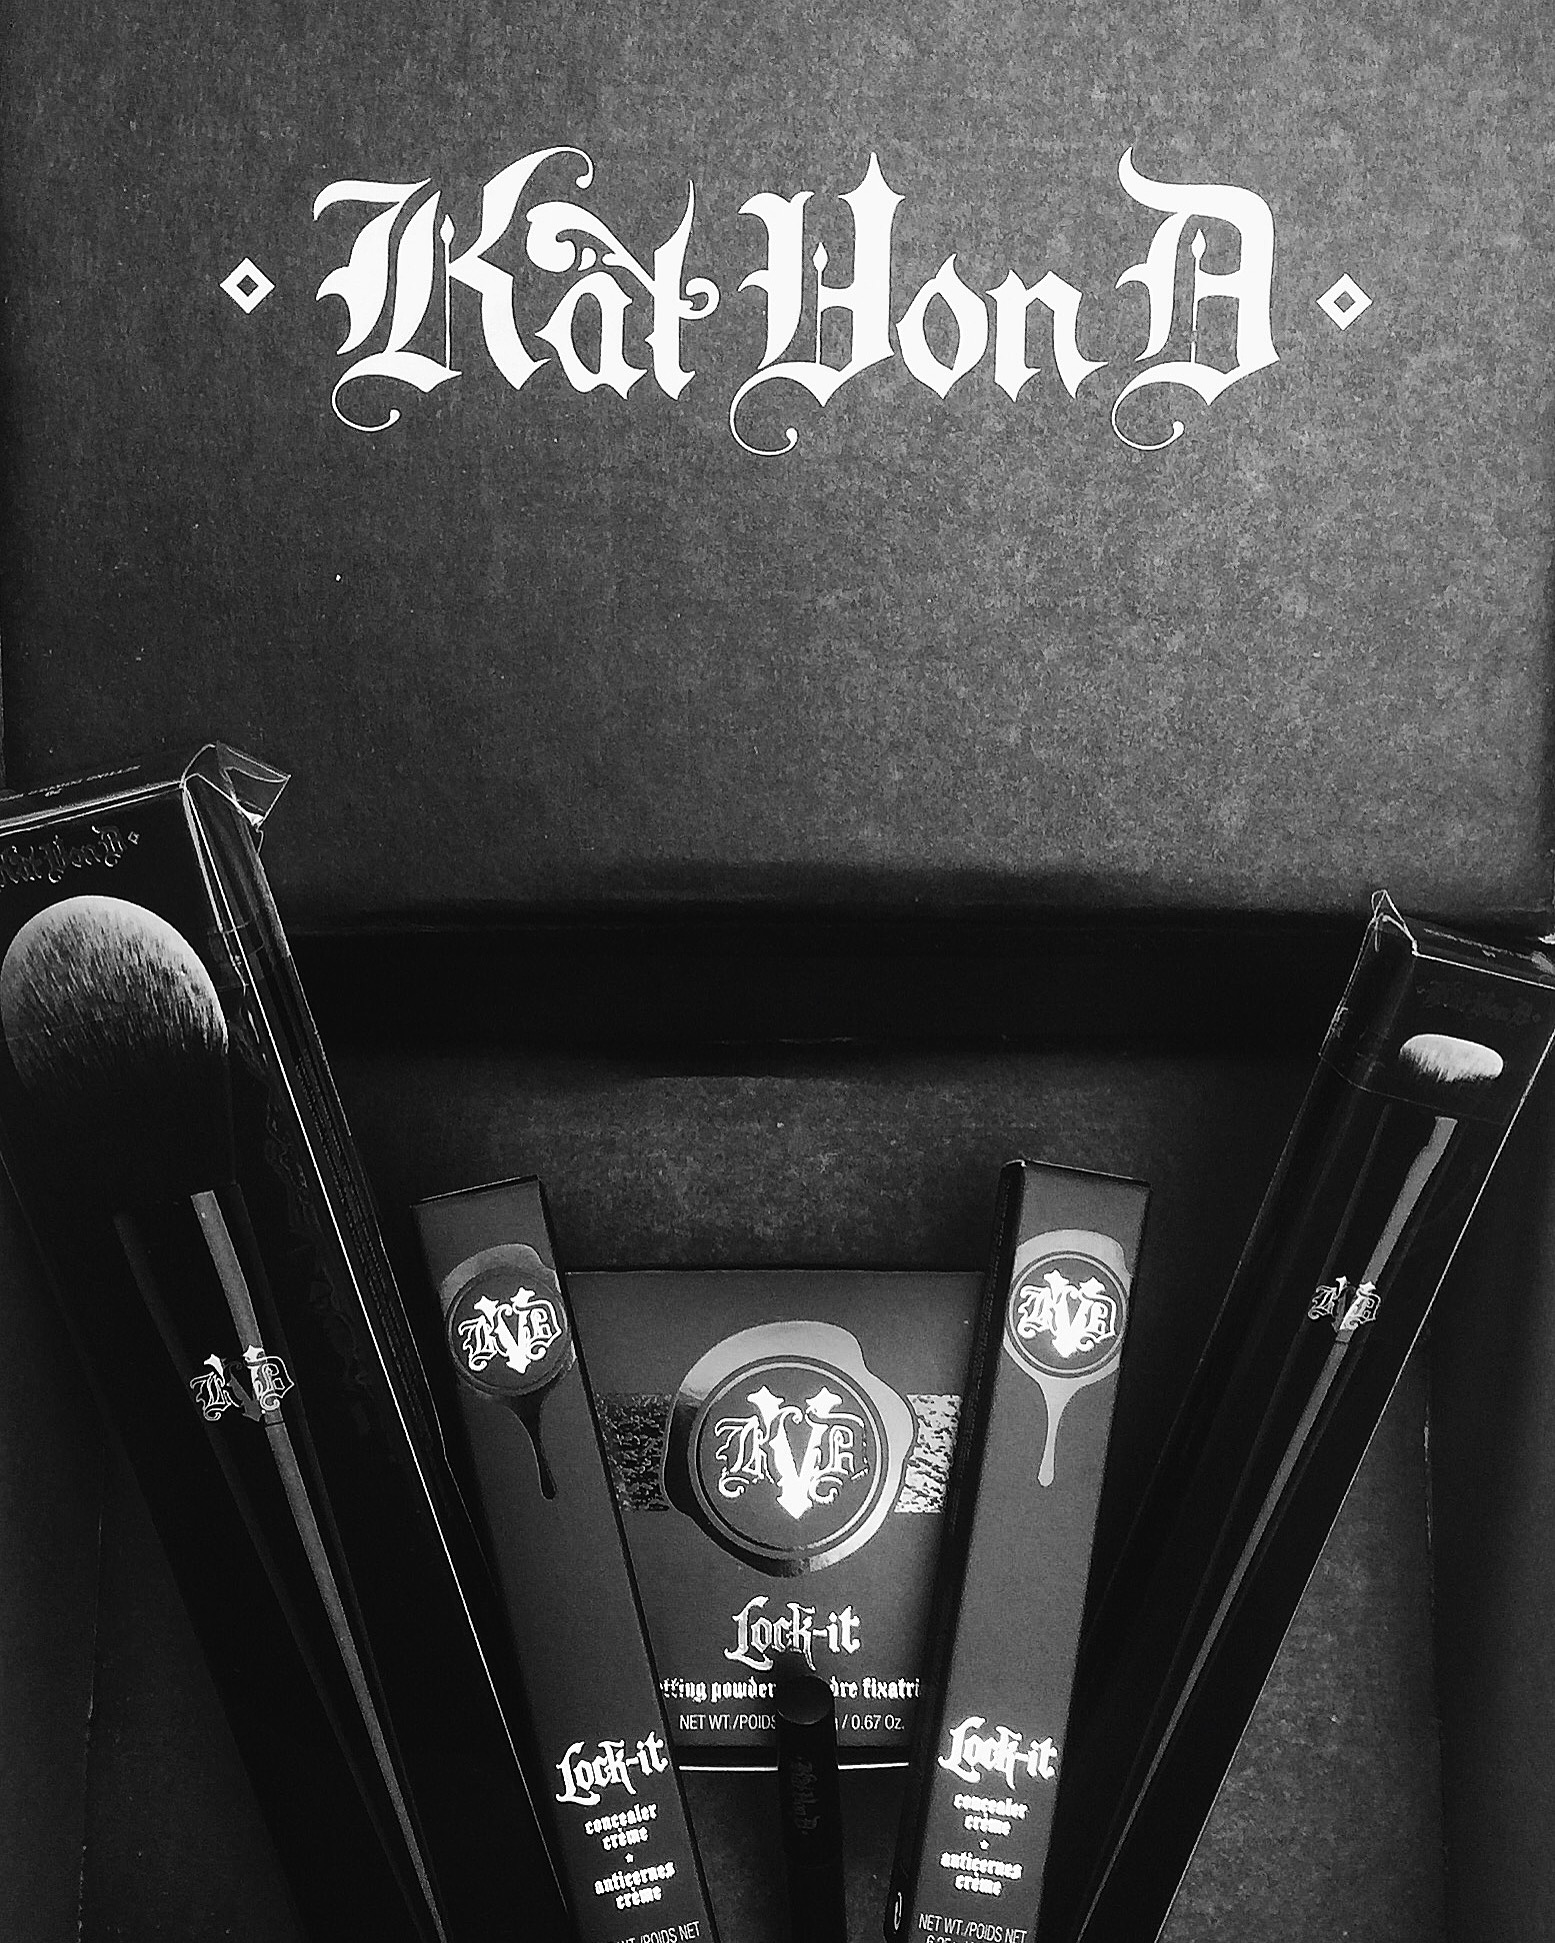 Marisa Robinson Makeup Artist Kat Von D Lock It Concealer and Setting Powder